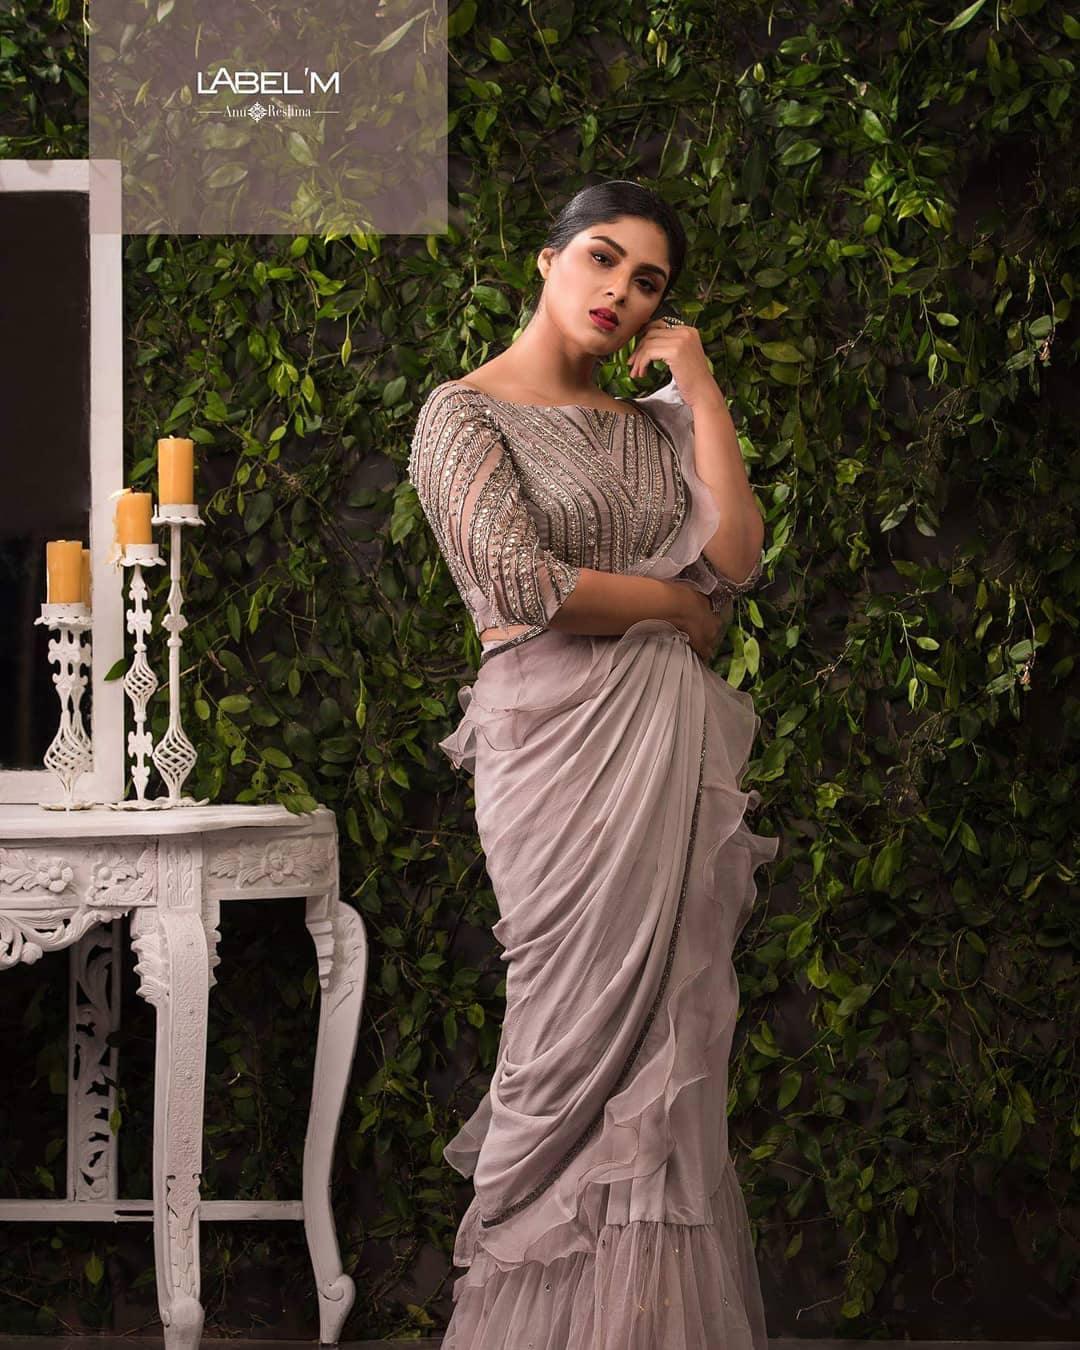 Samyuktha menon photo shoot for label m designers (10)